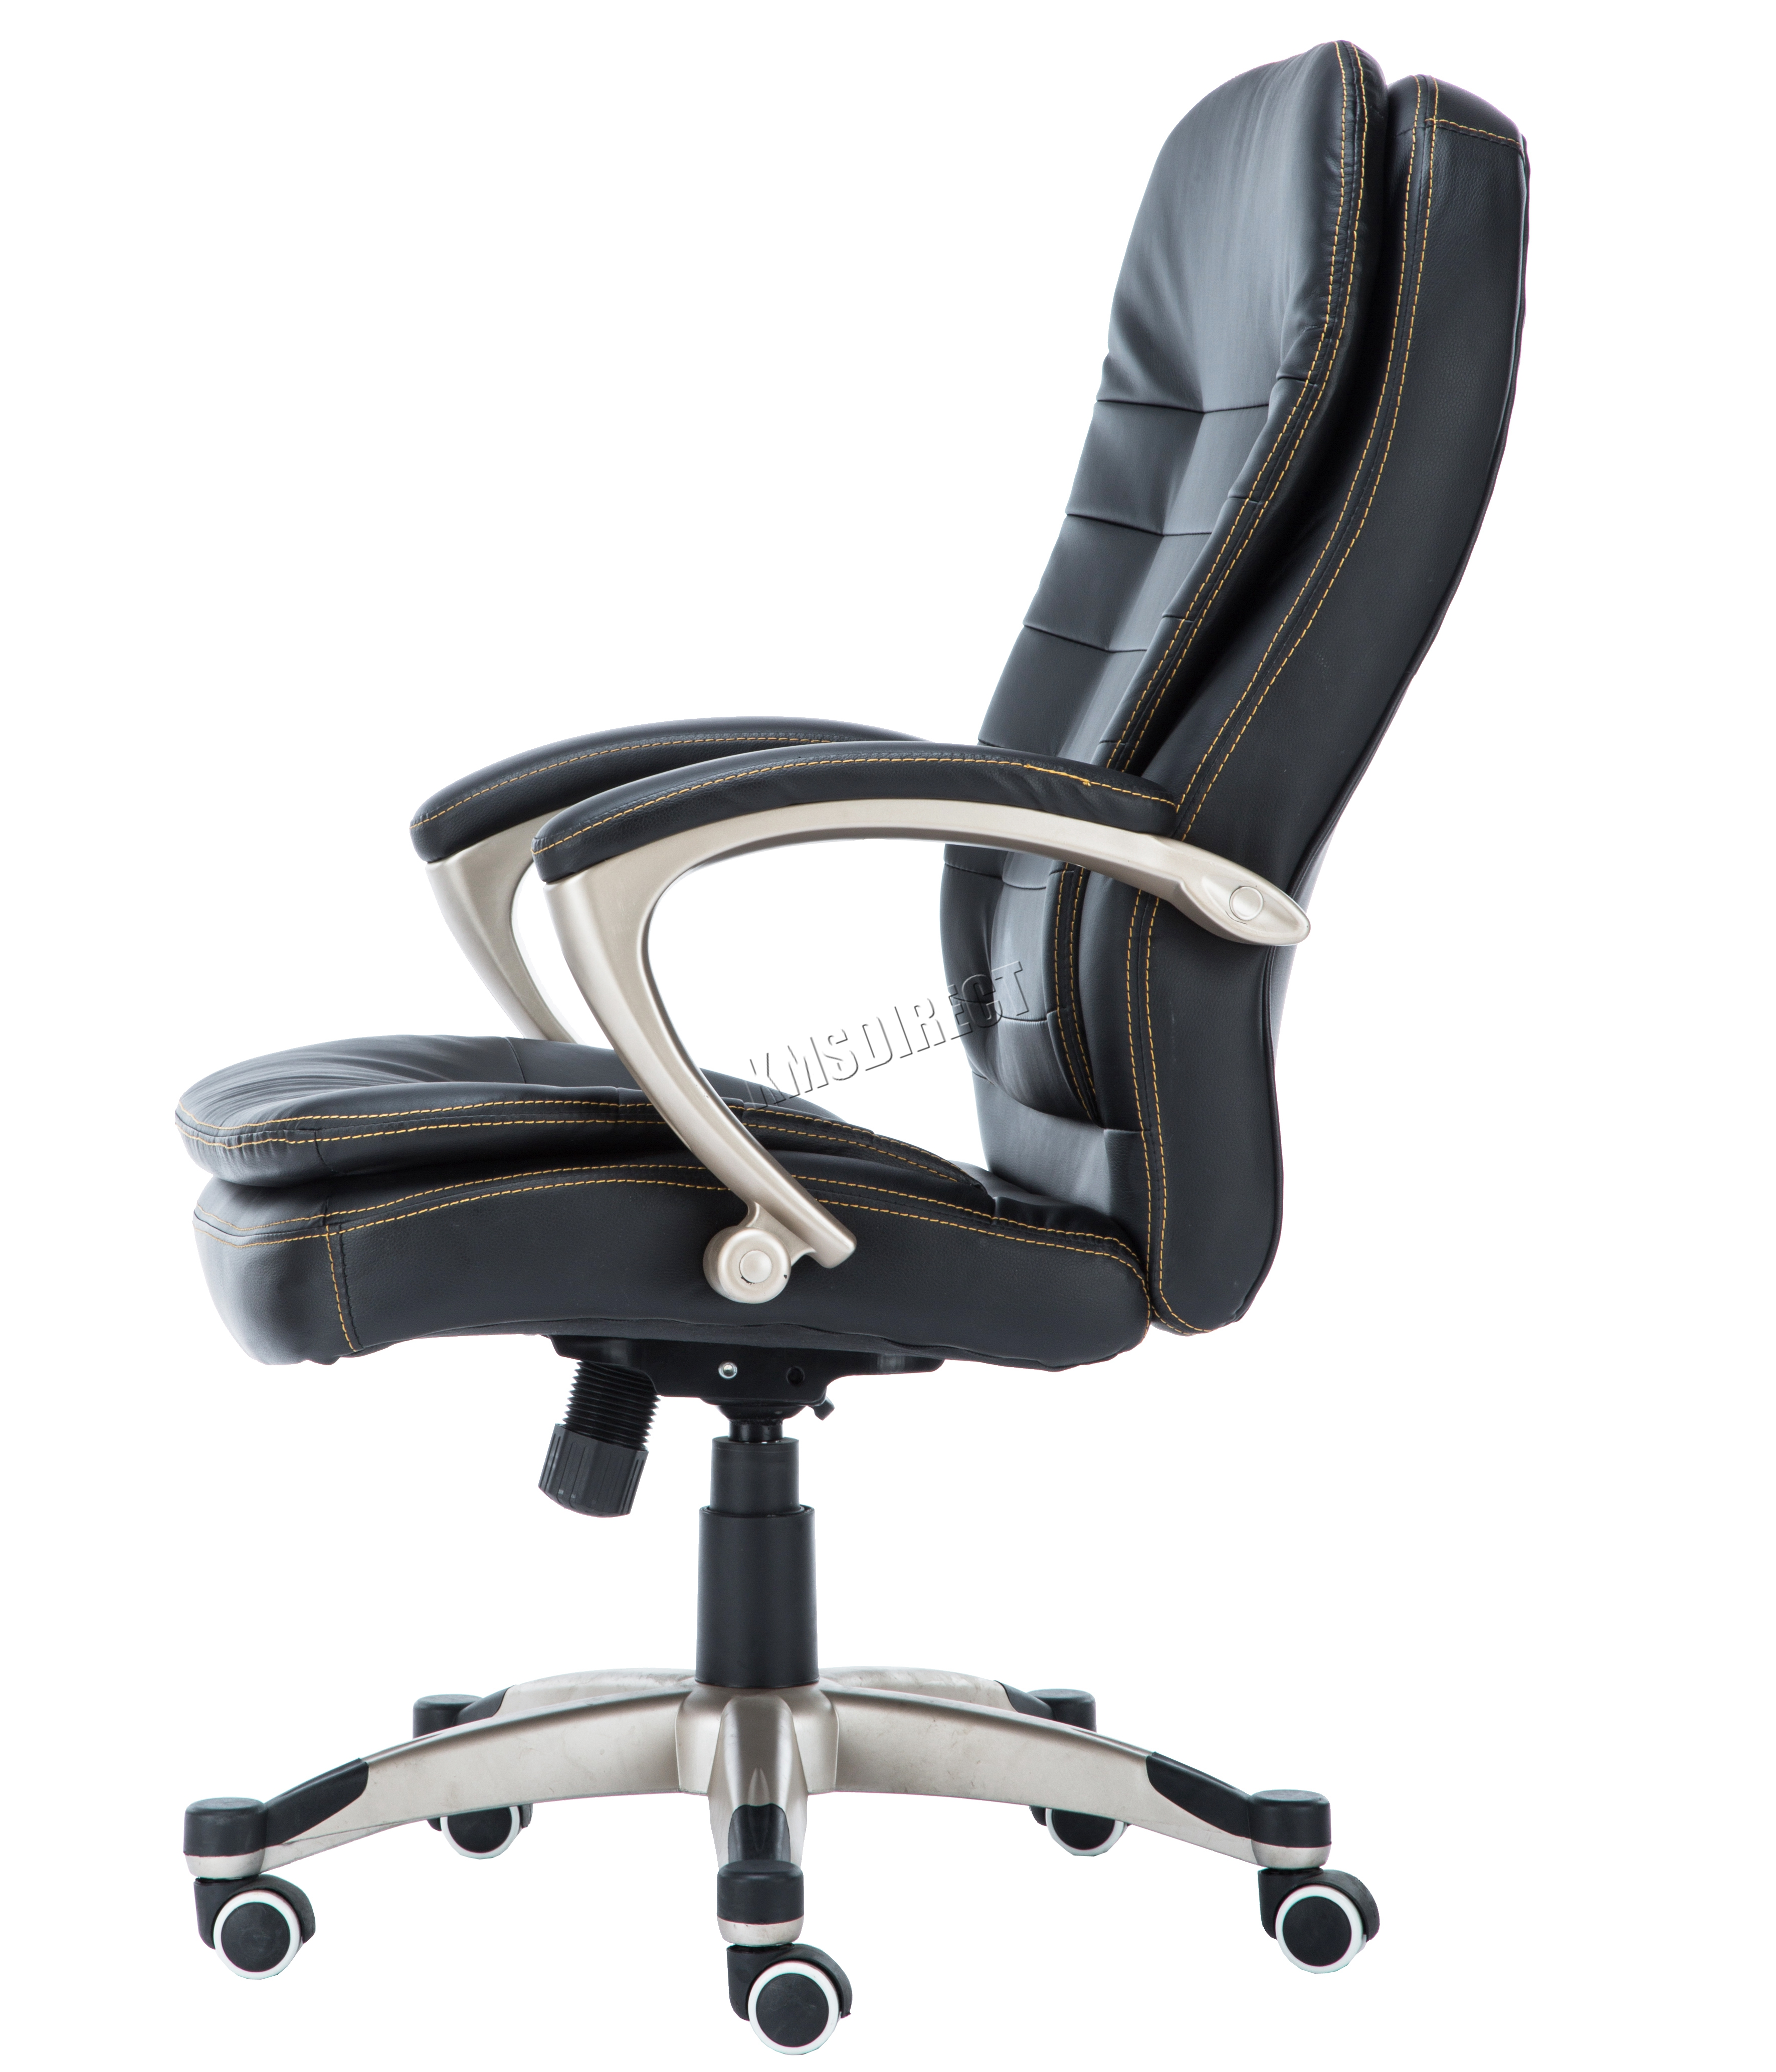 FoxHunter puter Executive fice Chair PU Leather Swivel High